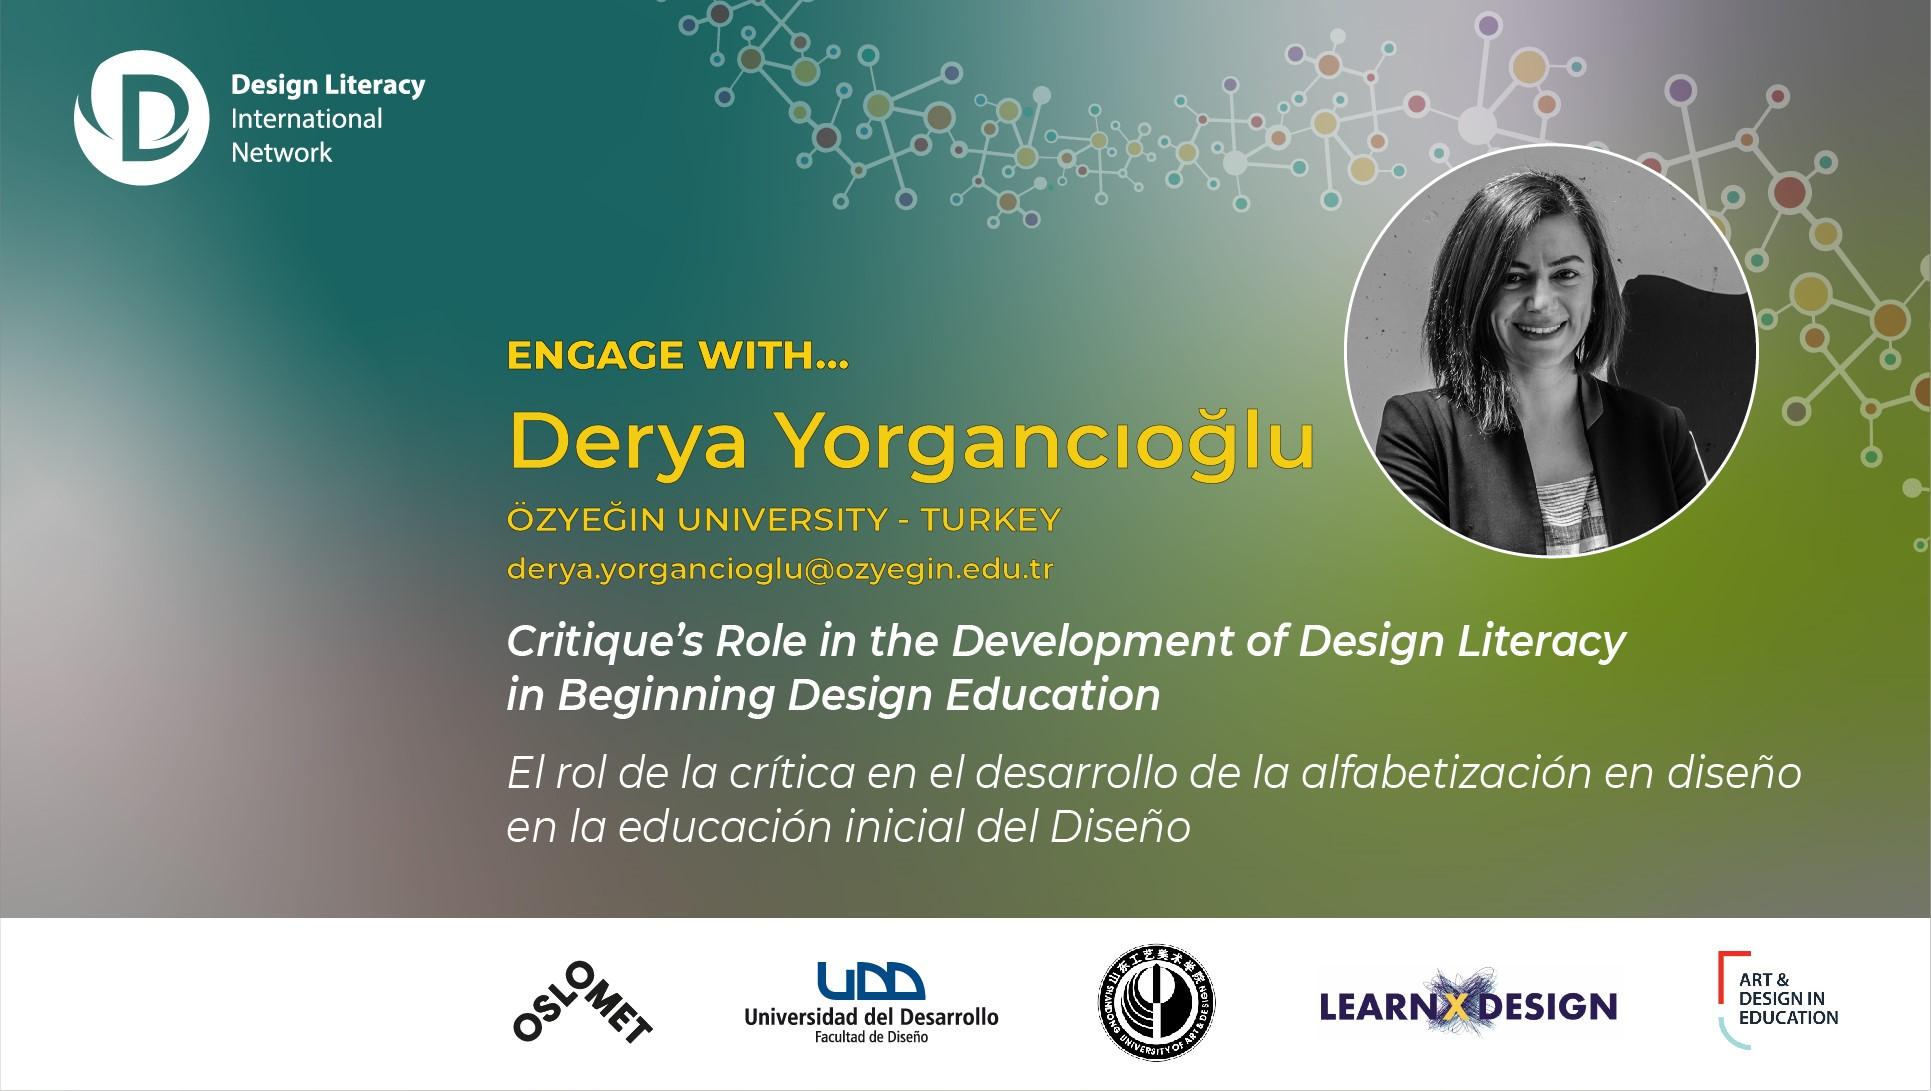 Engage with Derya Yorgancıoğlu   Event Archive